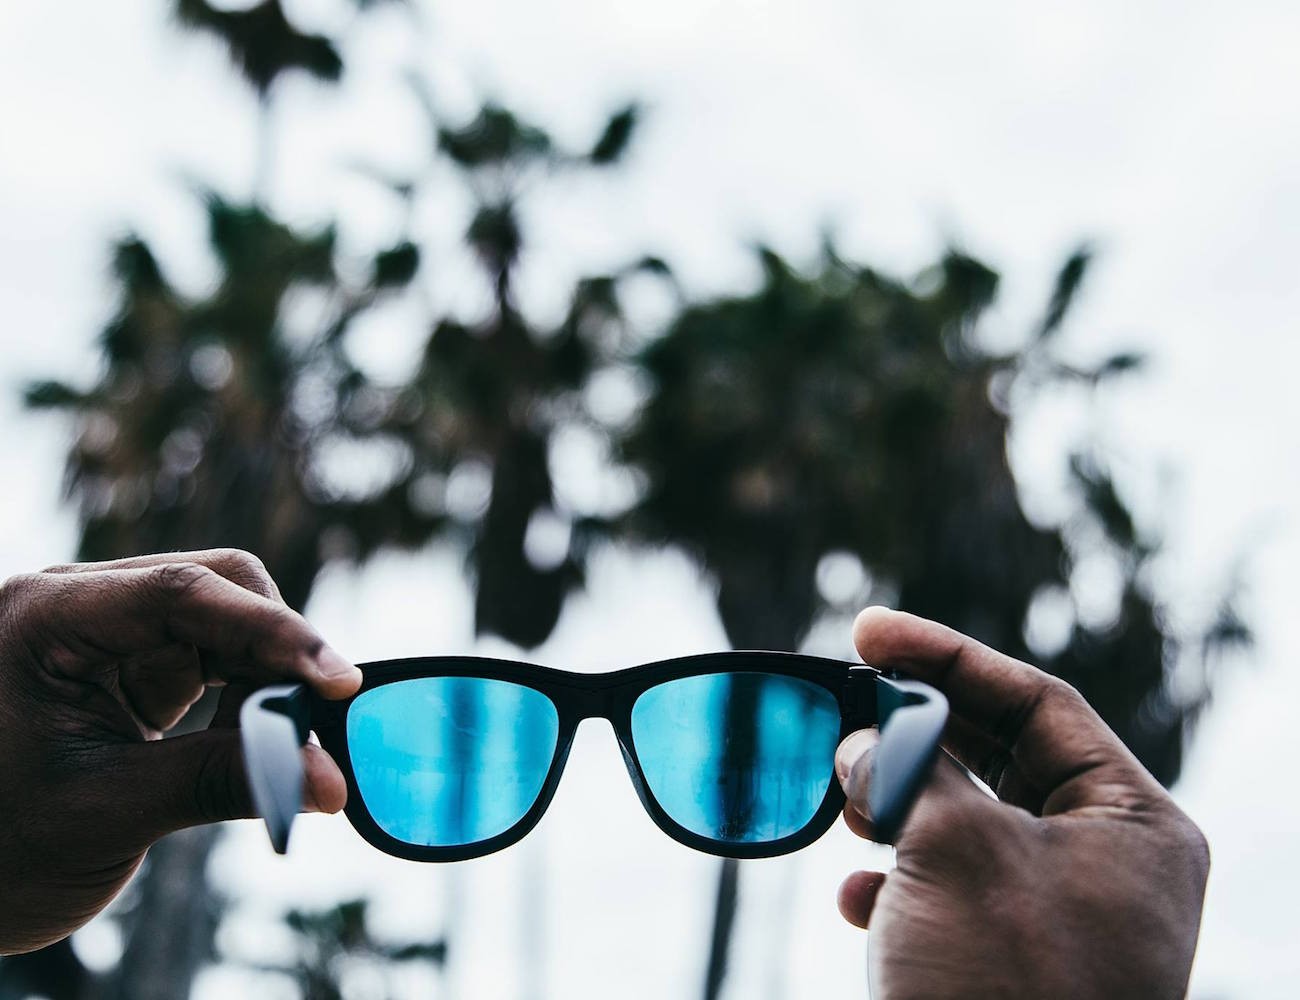 Panther Shades Bone Conduction Audio Sunglasses by Zungle